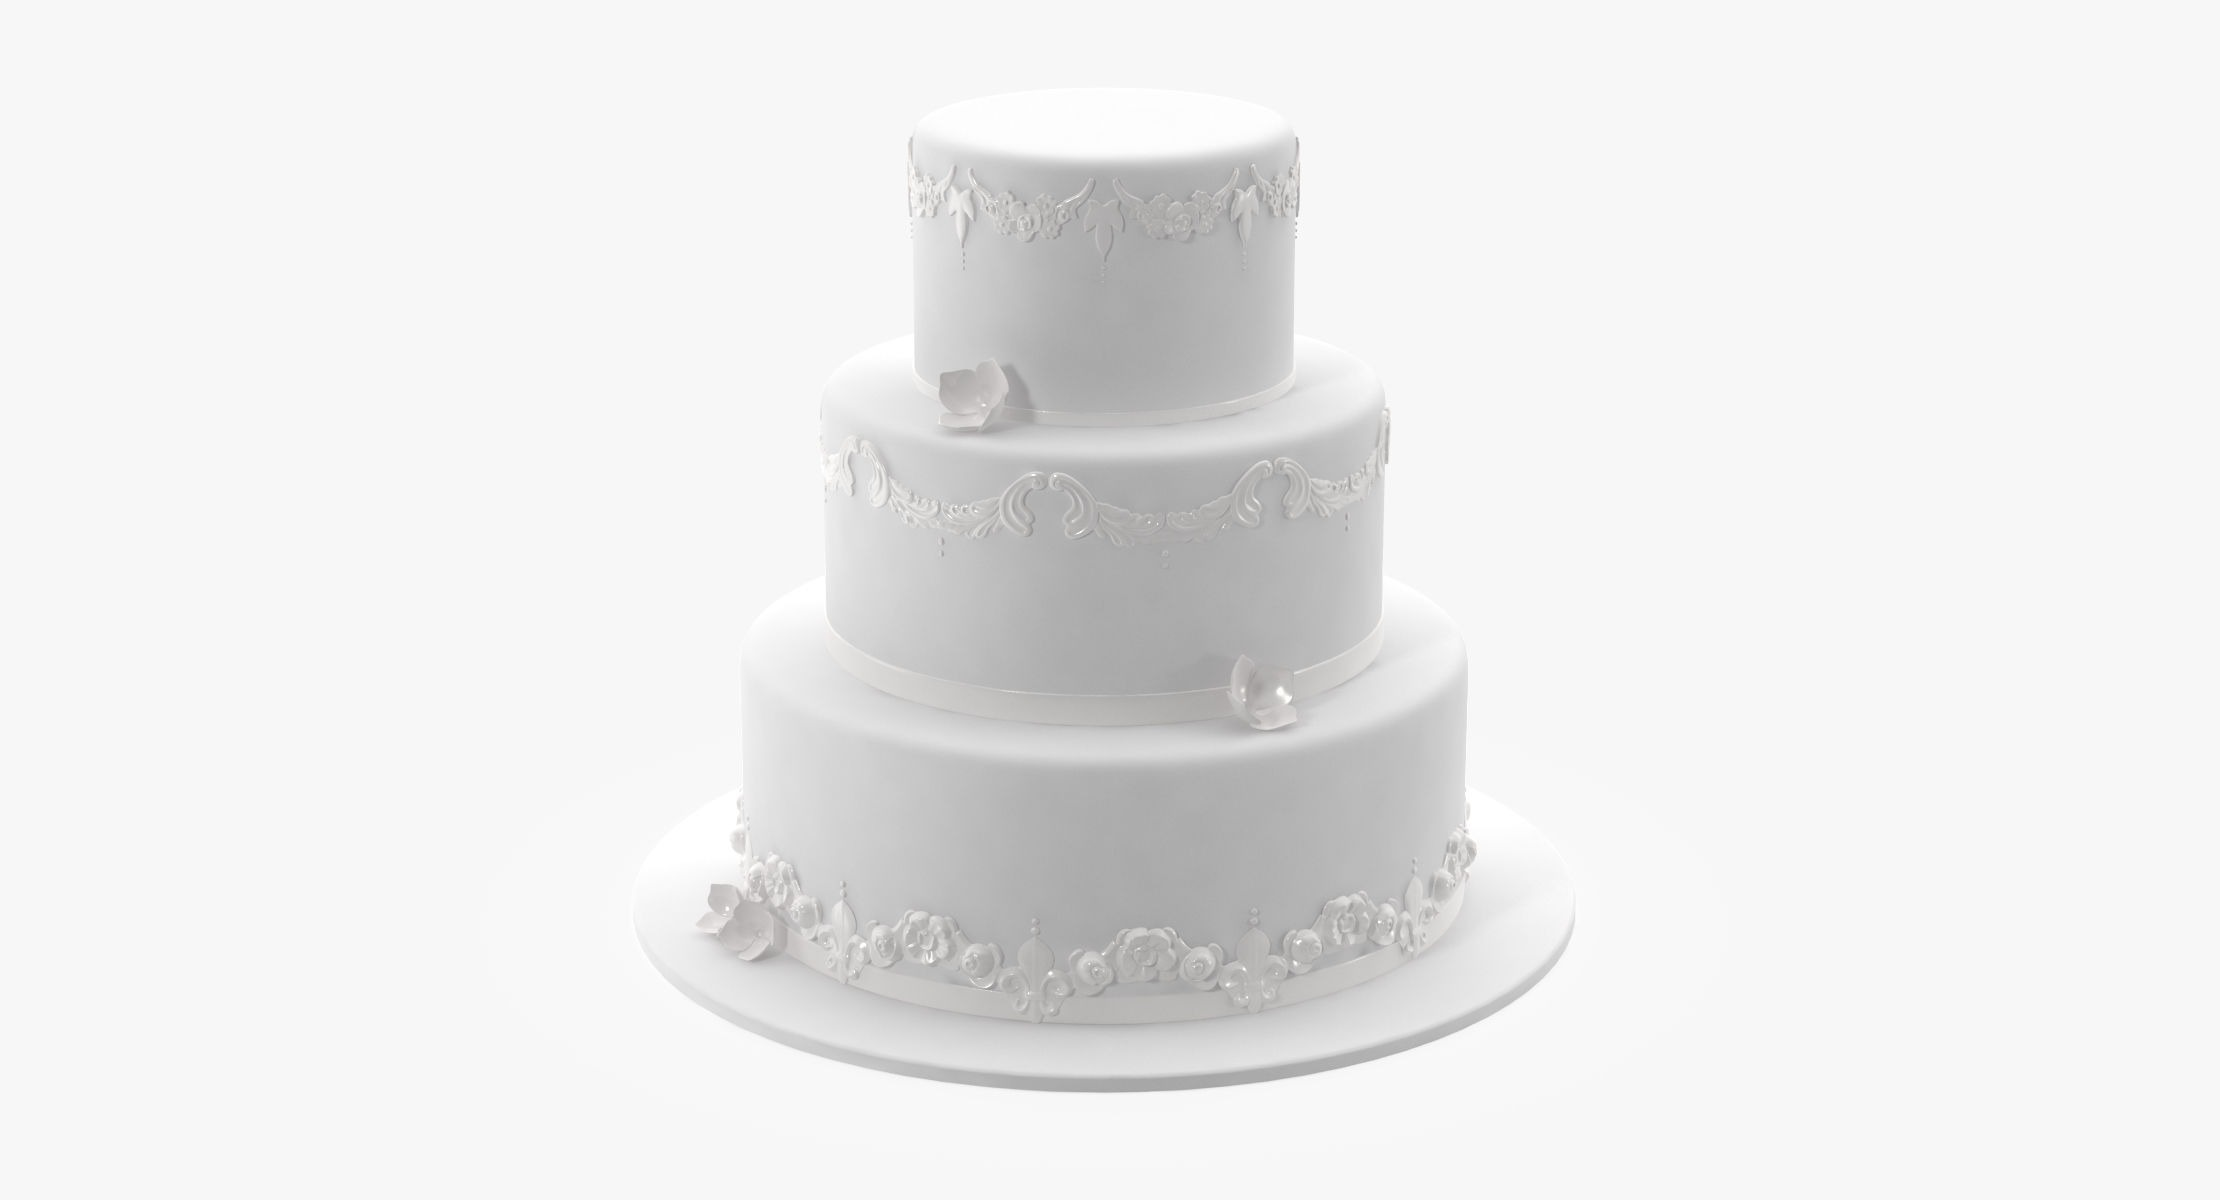 Round Wedding Cake - reel 1